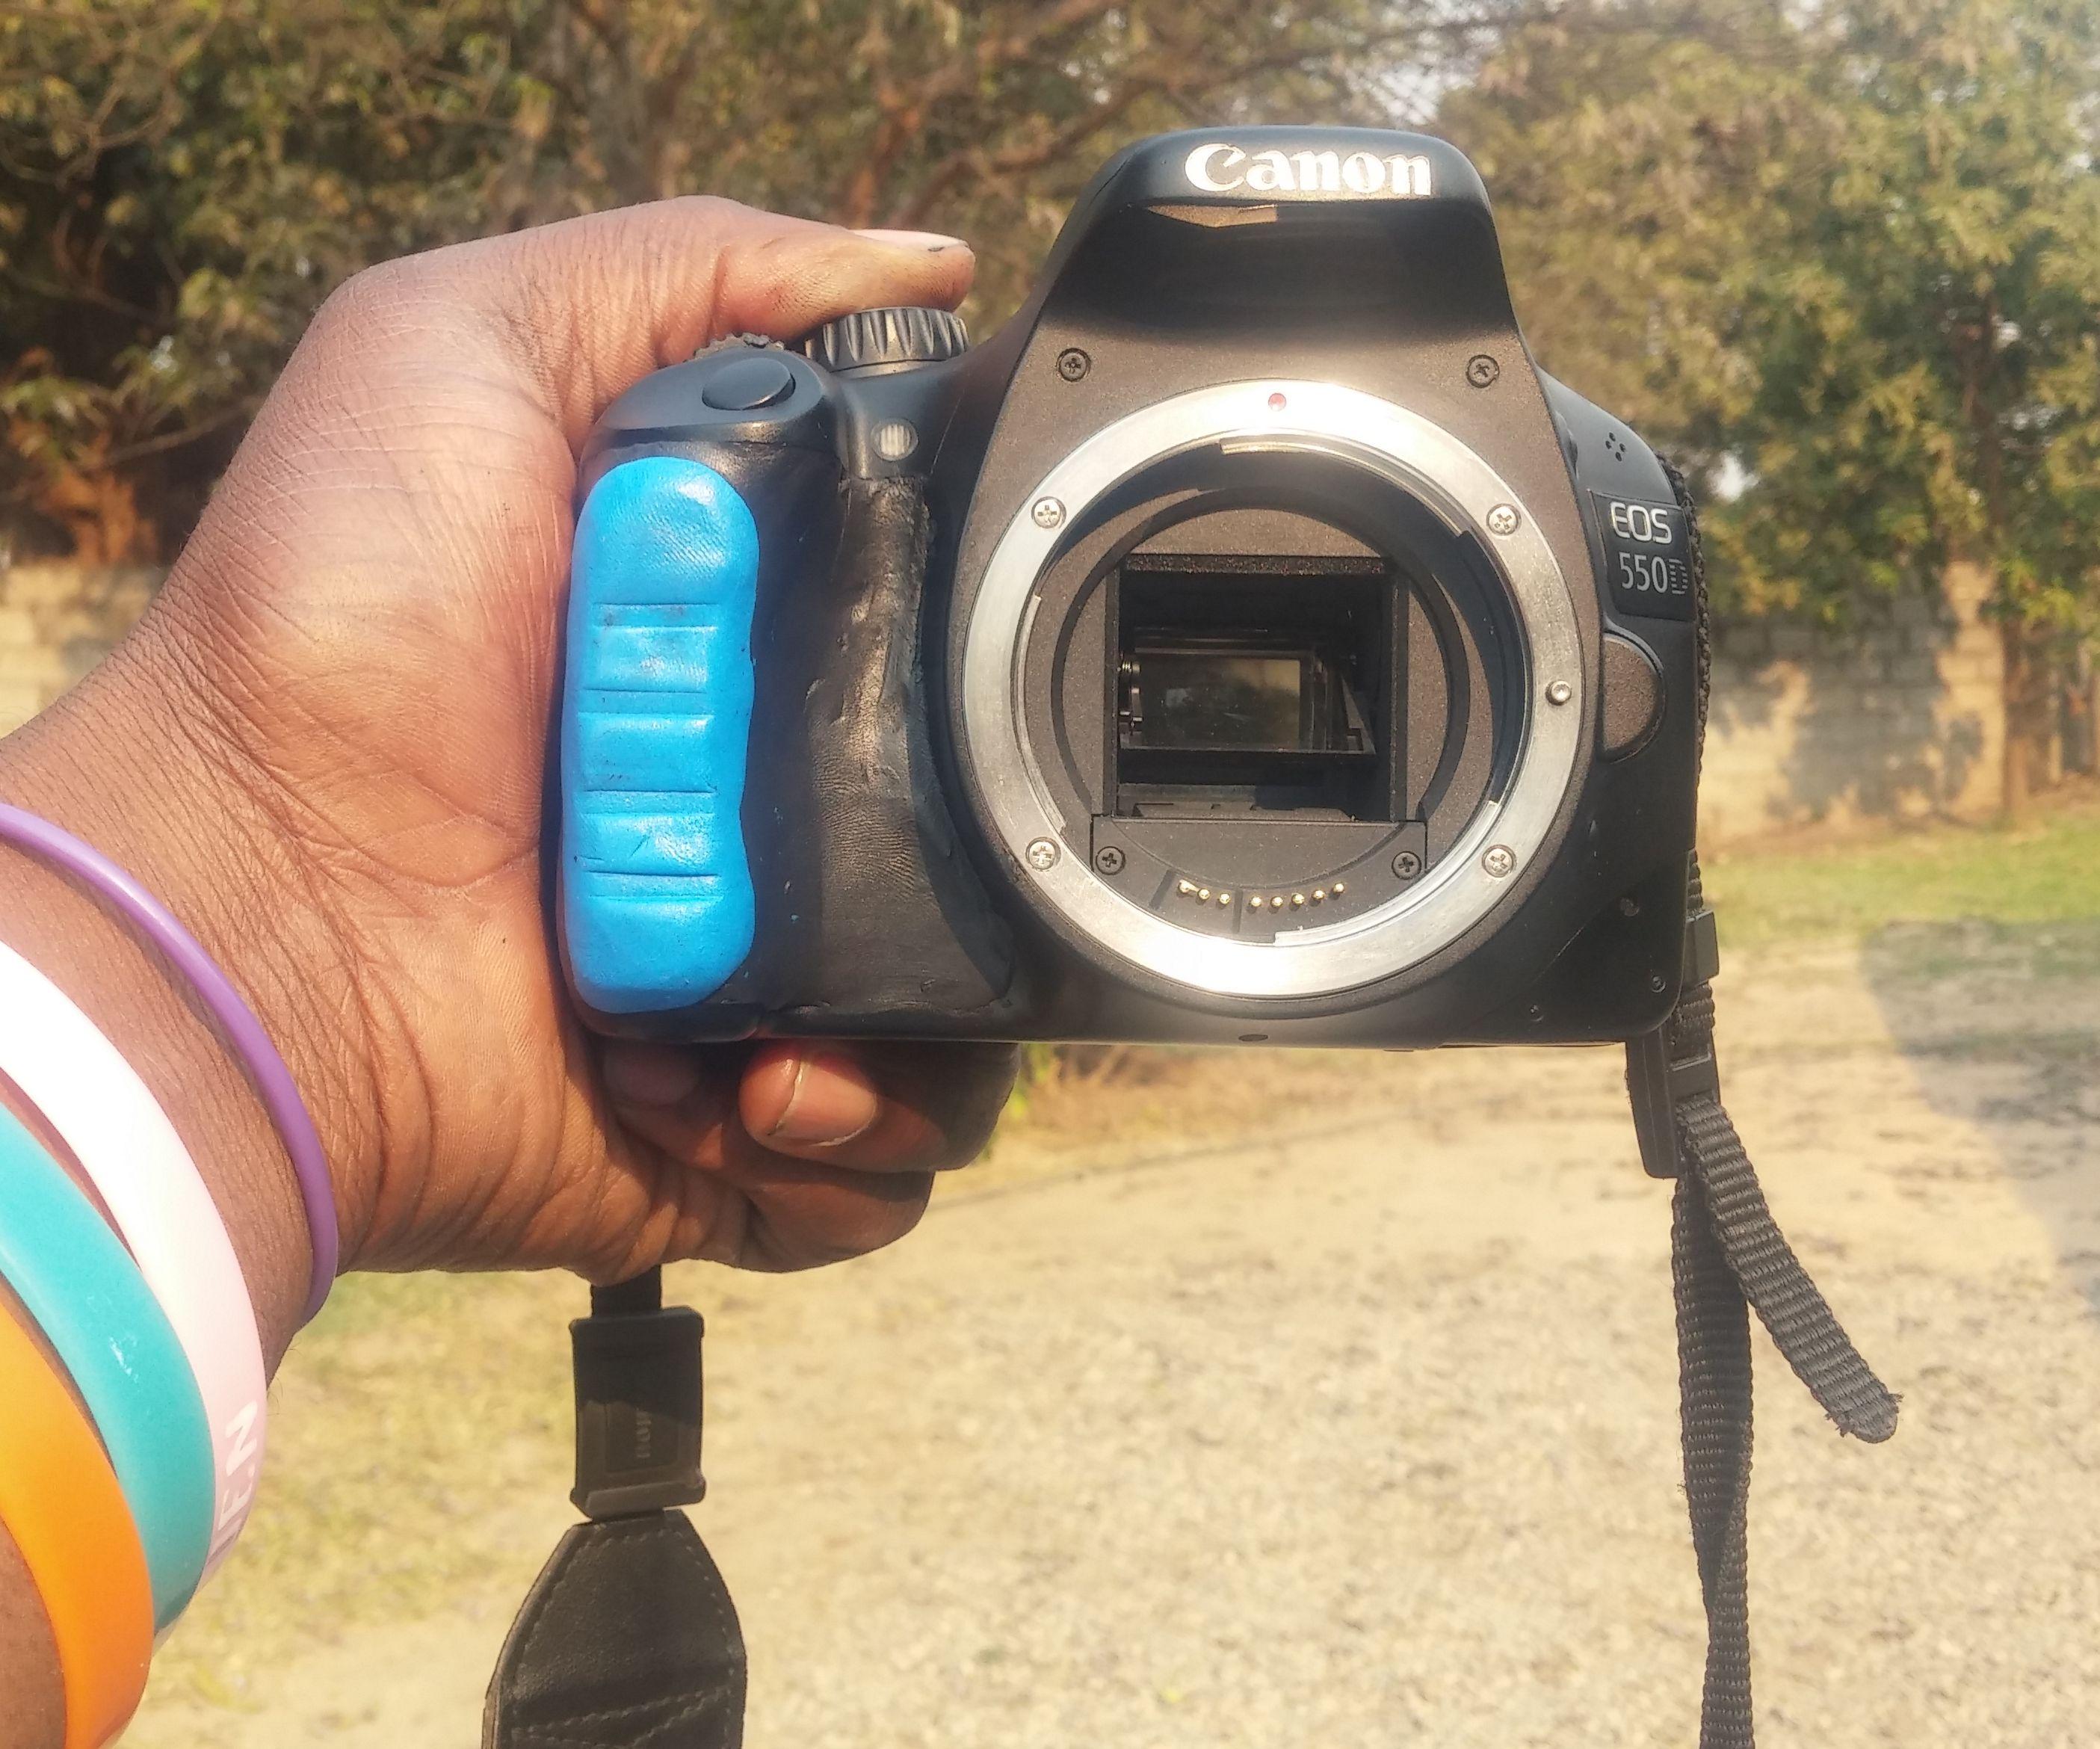 Camera Grip Restoration (Canon EOS 550D)